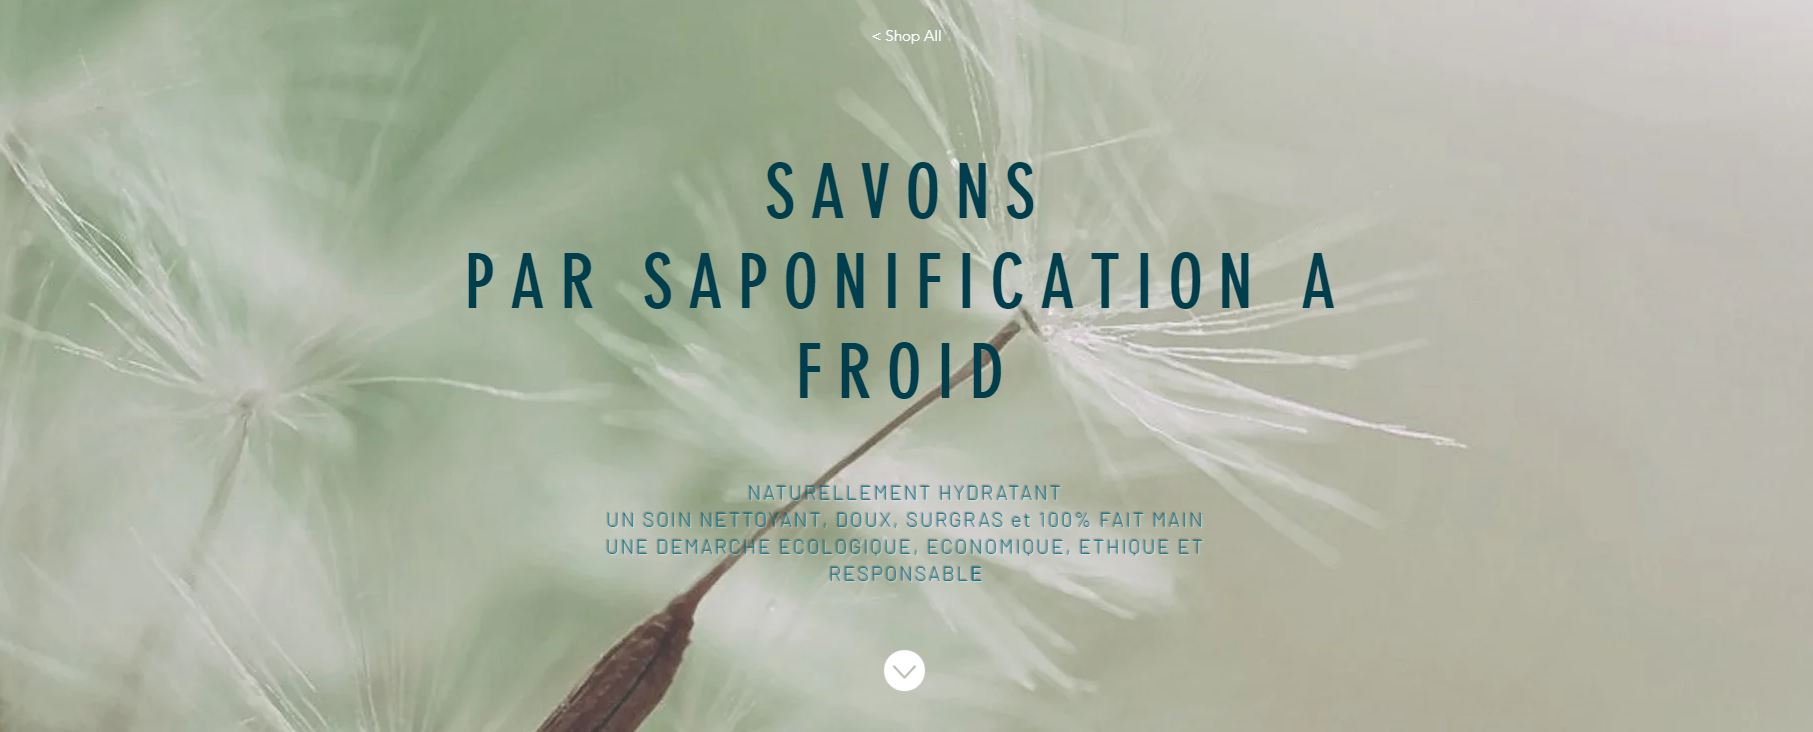 Savons_WIX.JPG